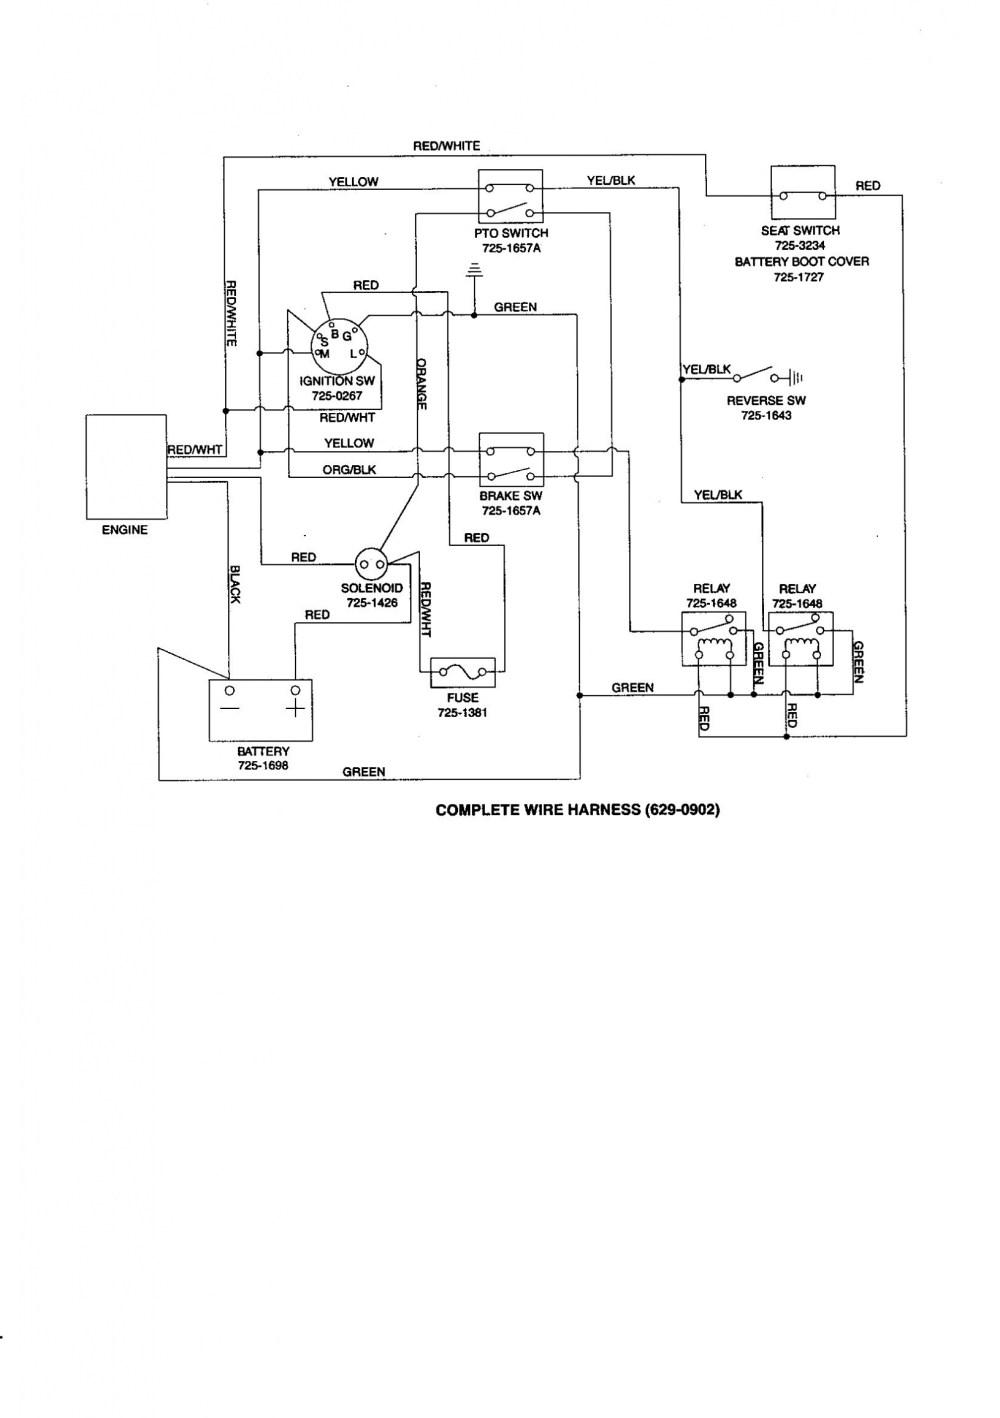 medium resolution of 1631x2314 wiring diagram yard machine lawn tractor wiring diagram riding lawn mower drawing